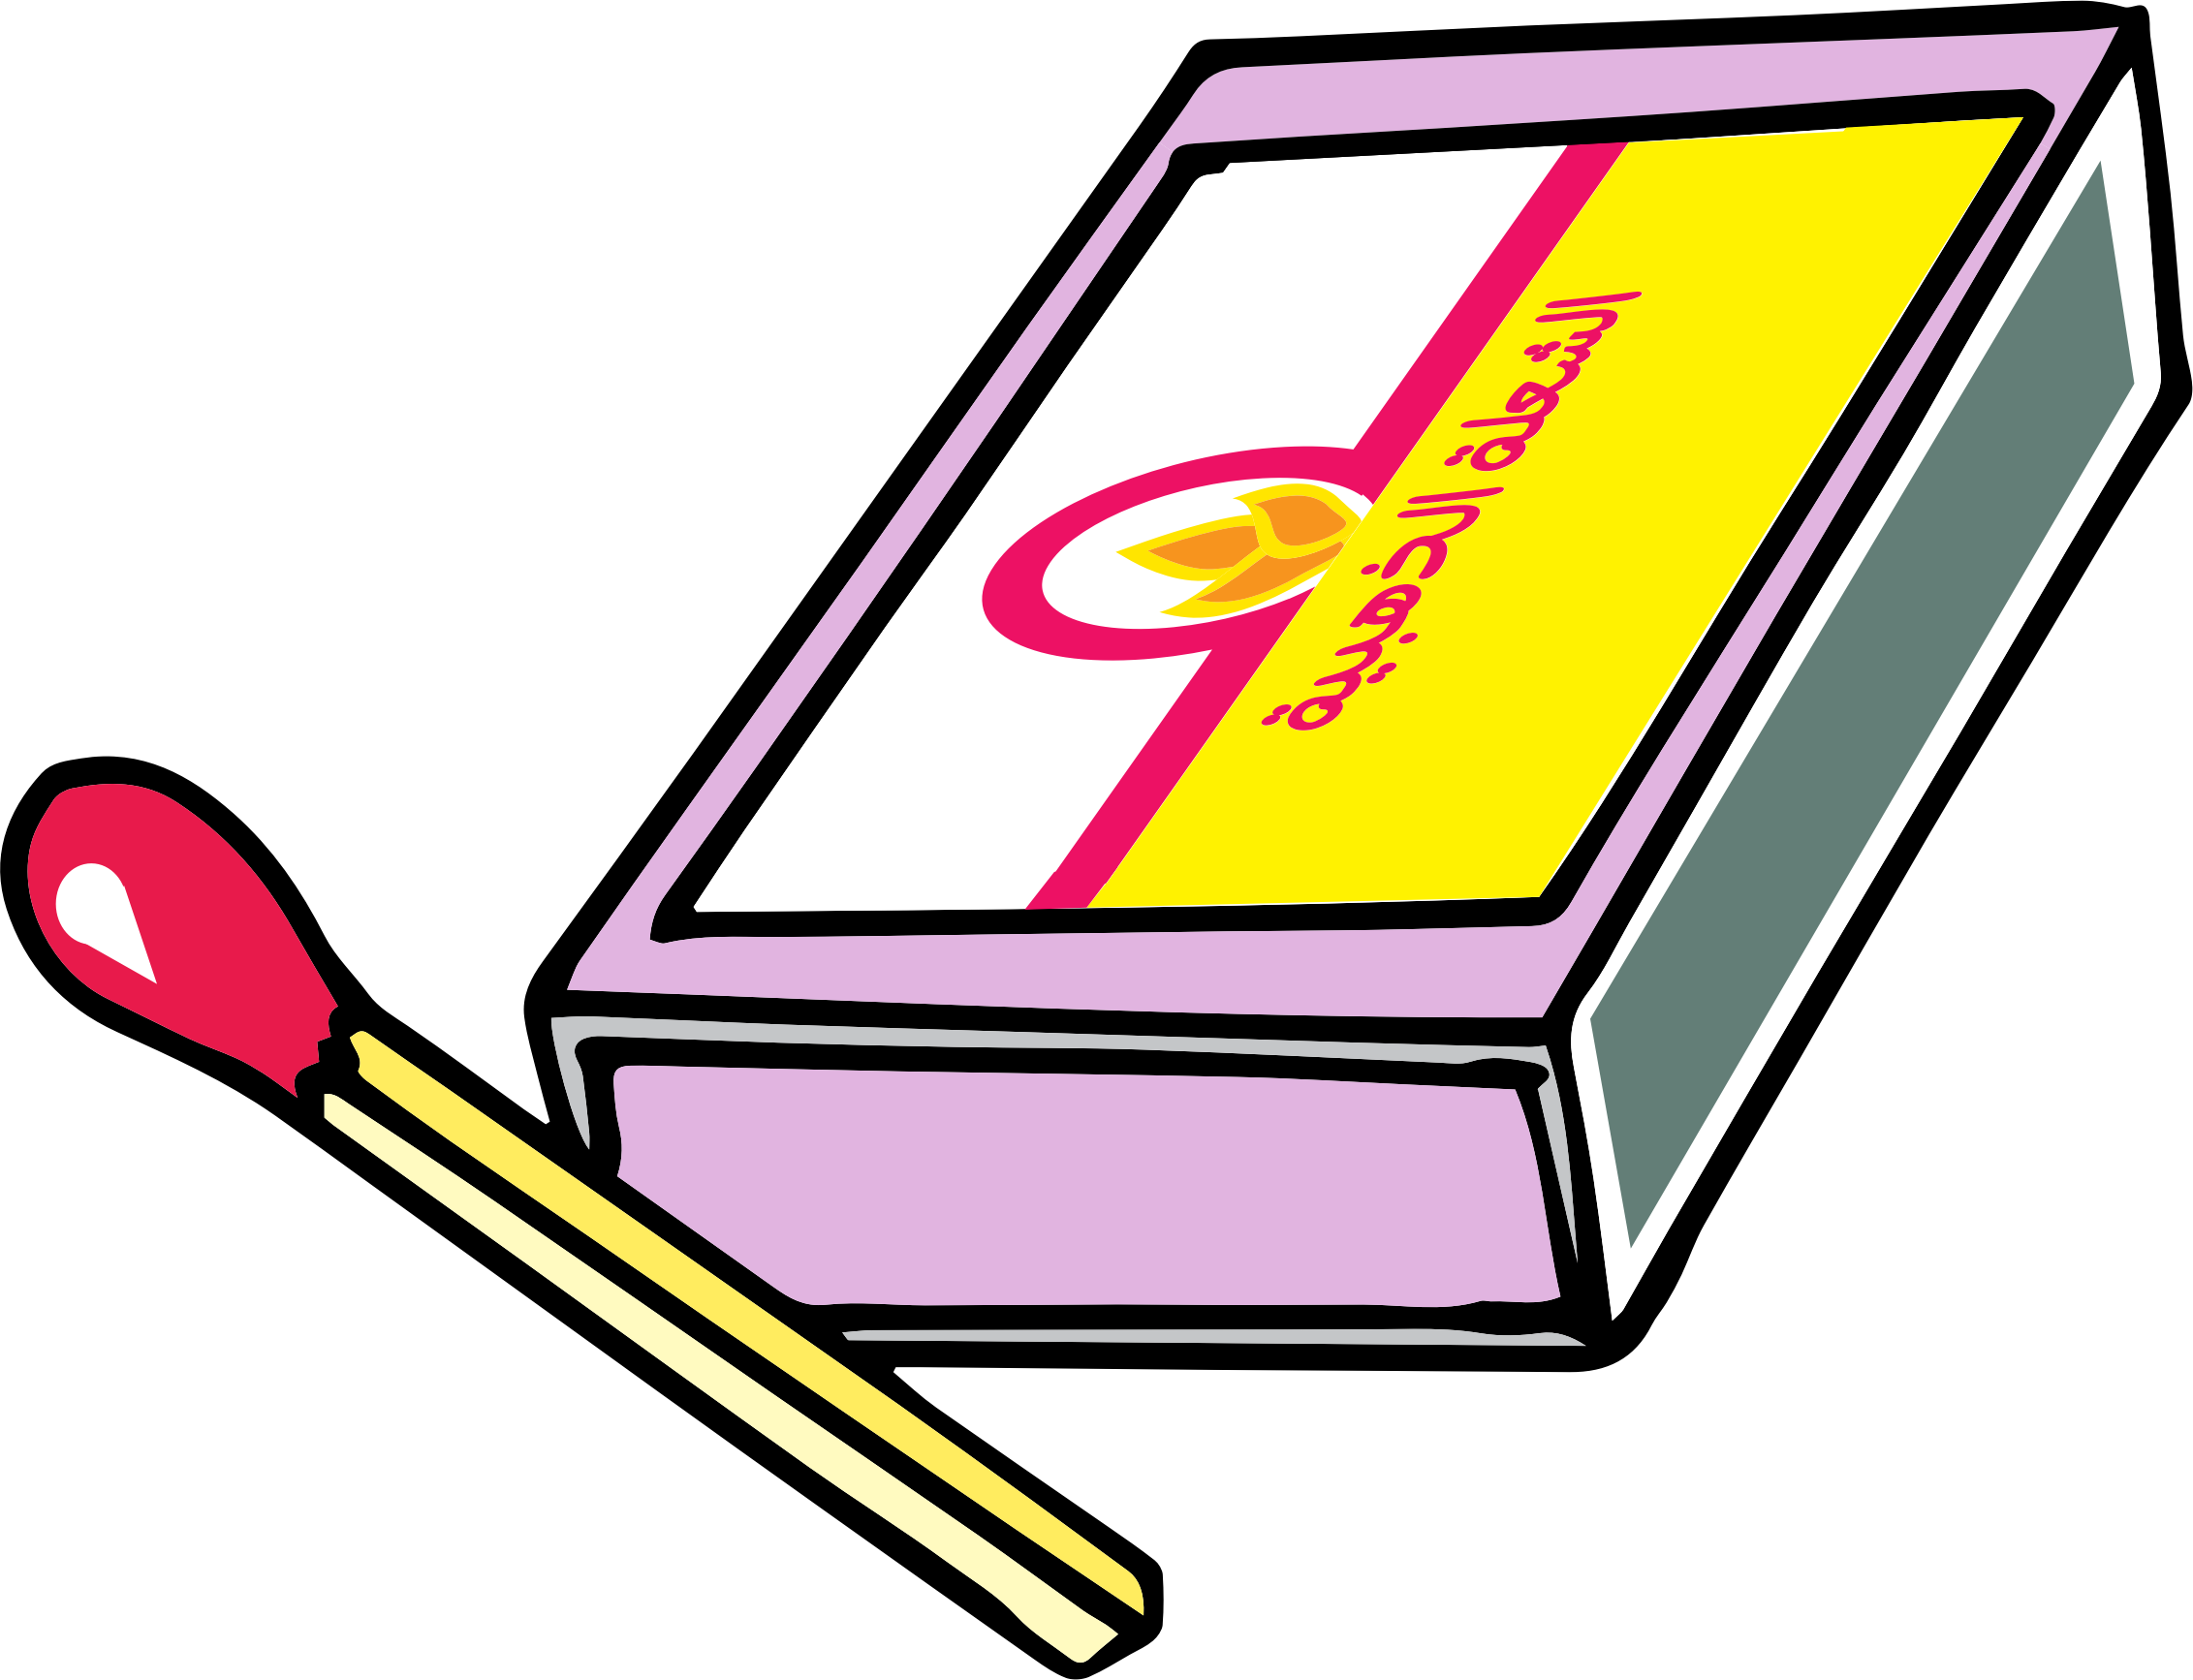 Clipart - safety matches علبة كبريت for Matches Clip Art  70ref